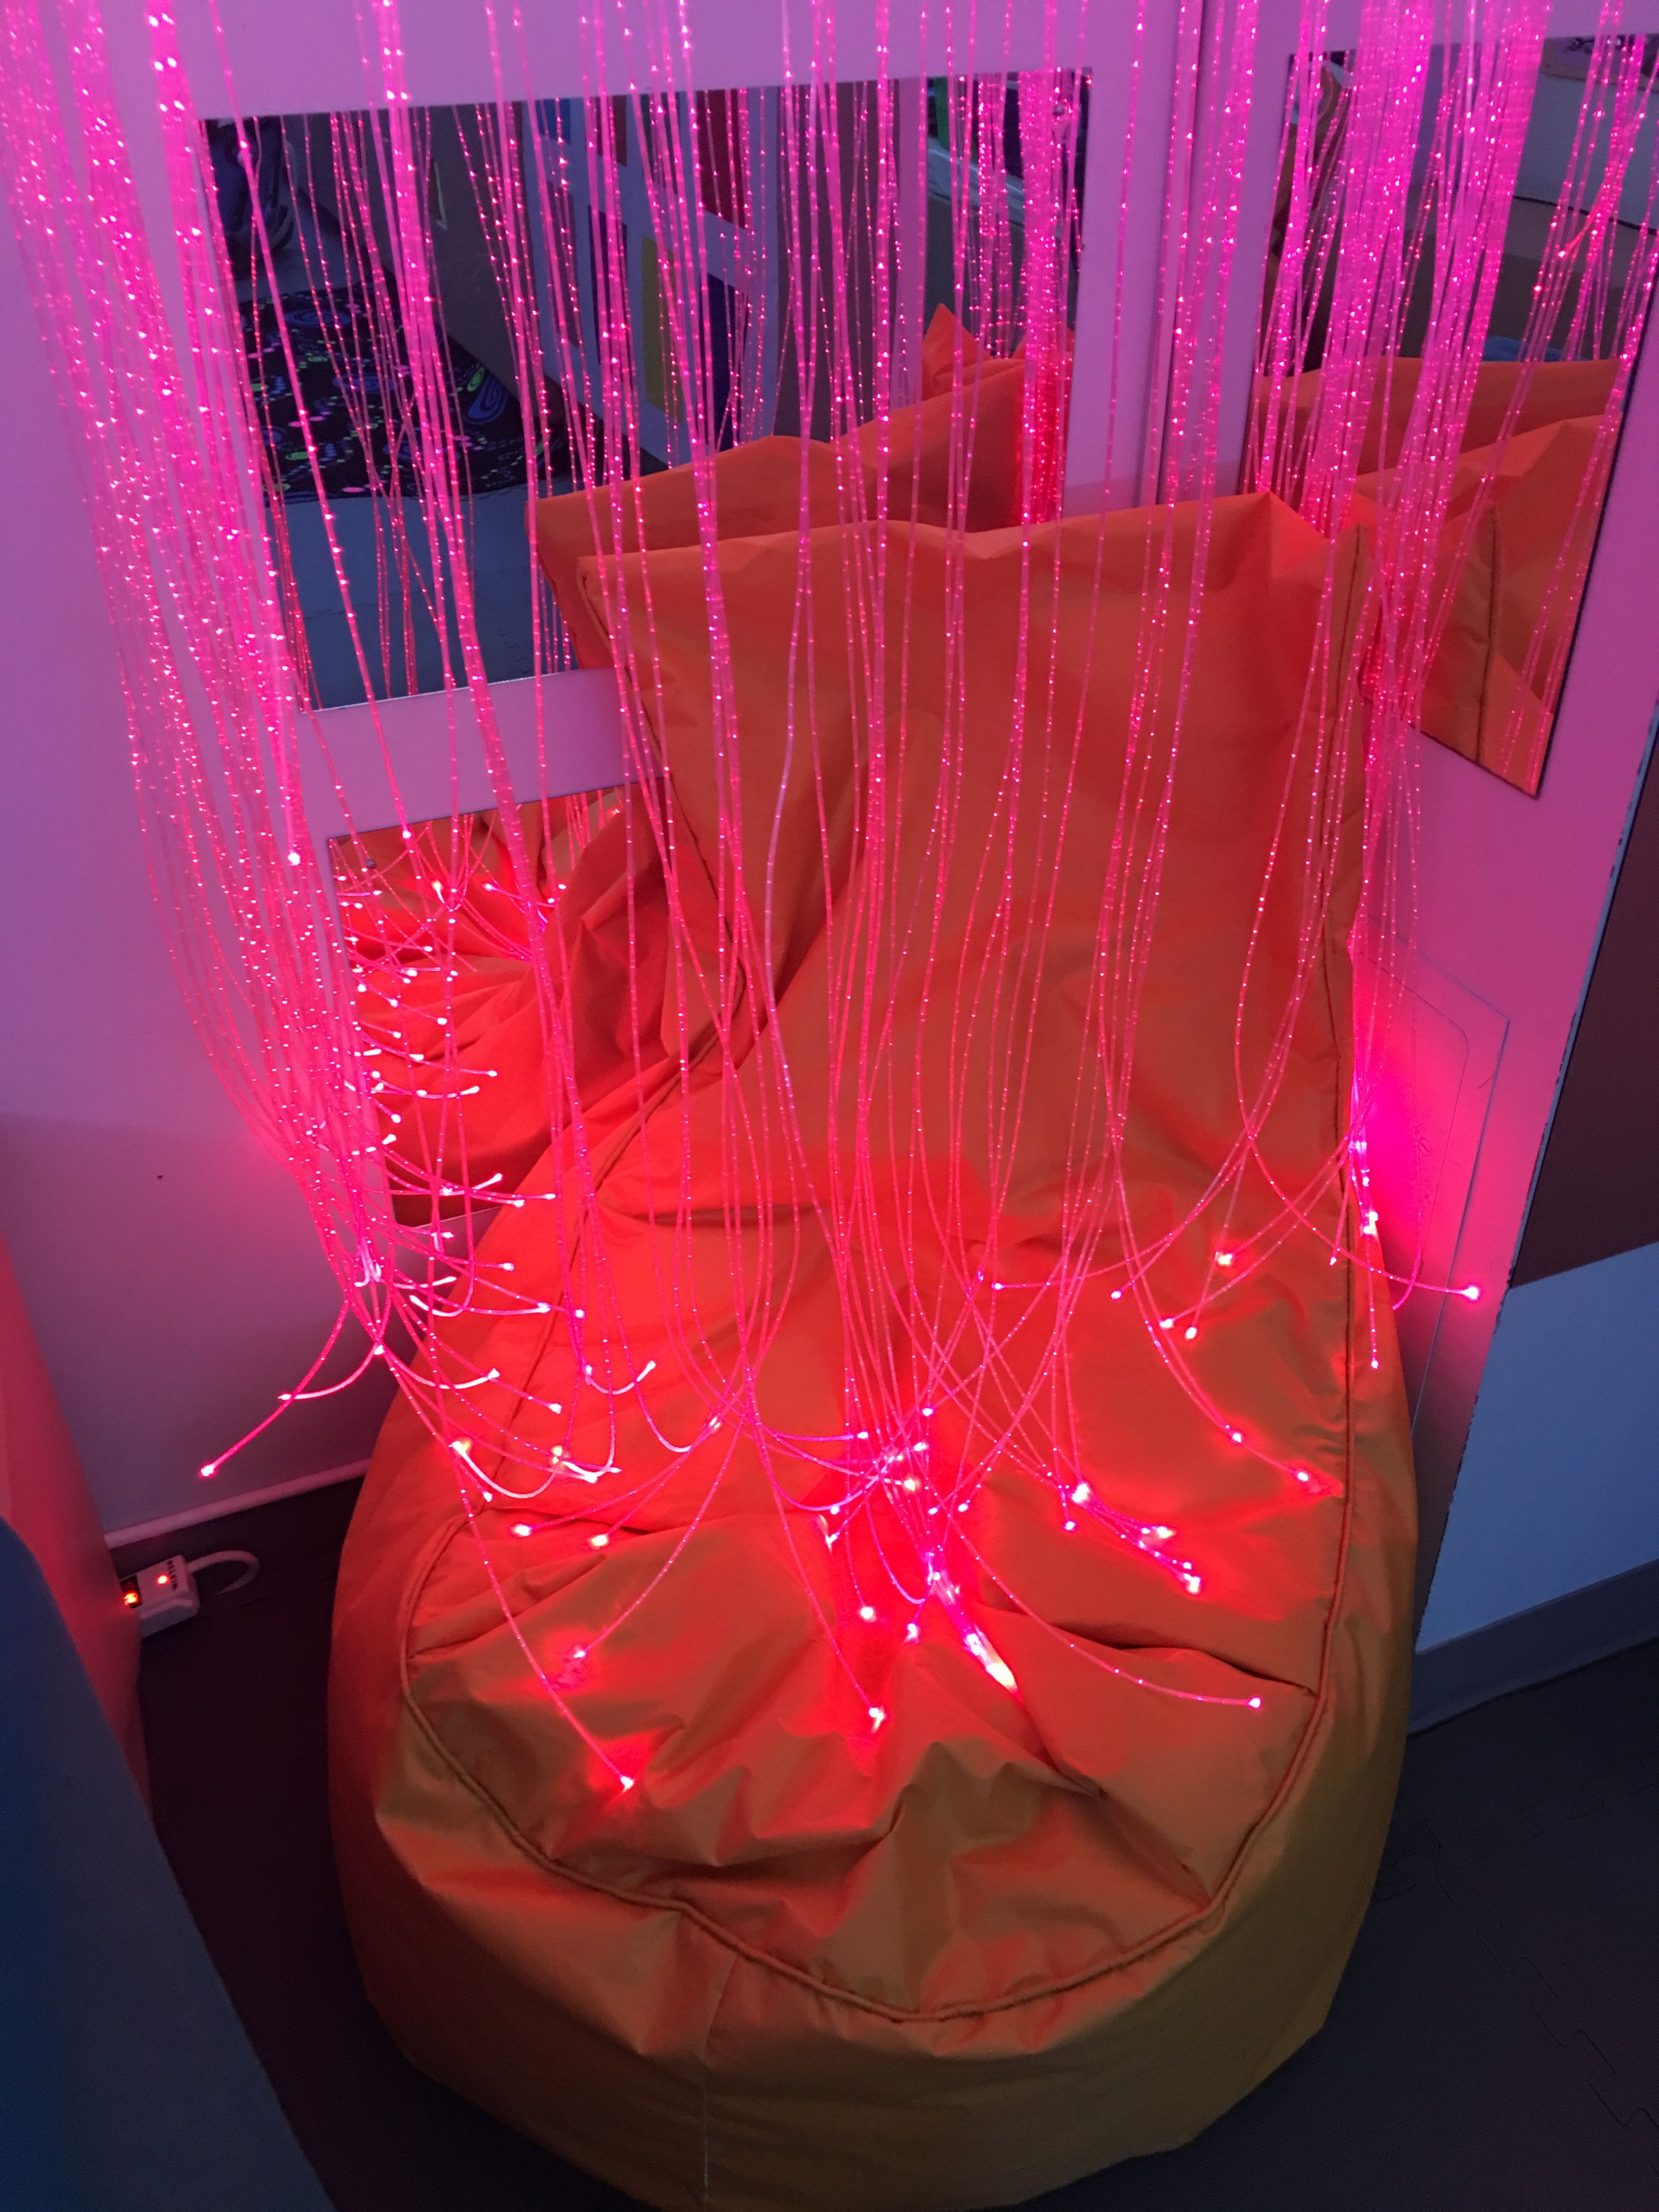 100 Fibre Optic Tails - Calming Sensory Room | TFH Canada ...